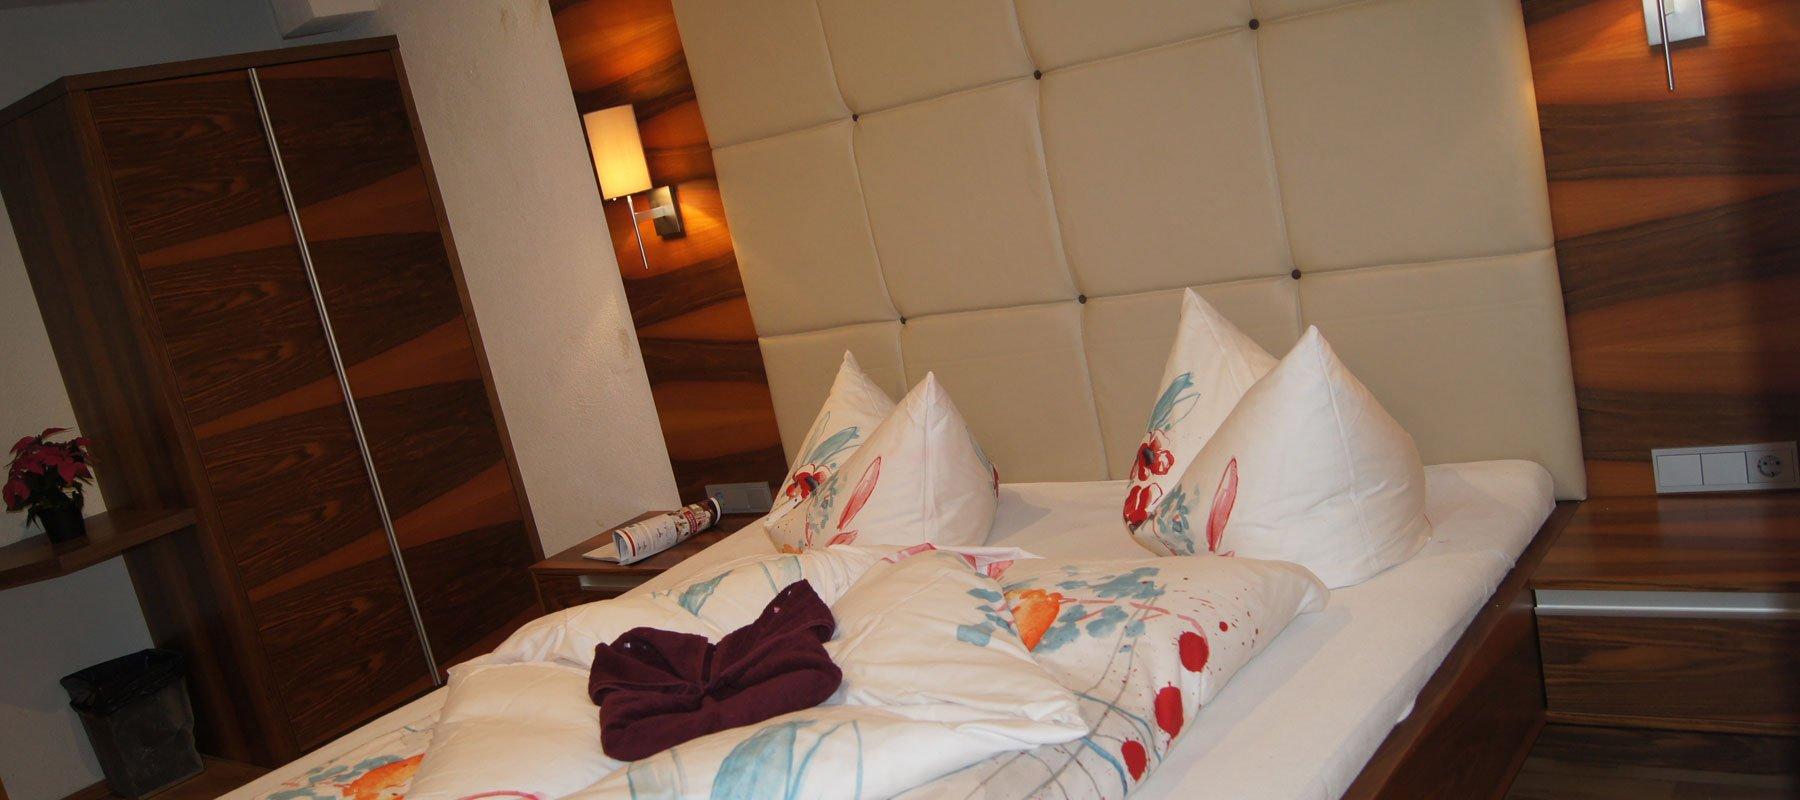 Zimmer im Haus Alpenroyal